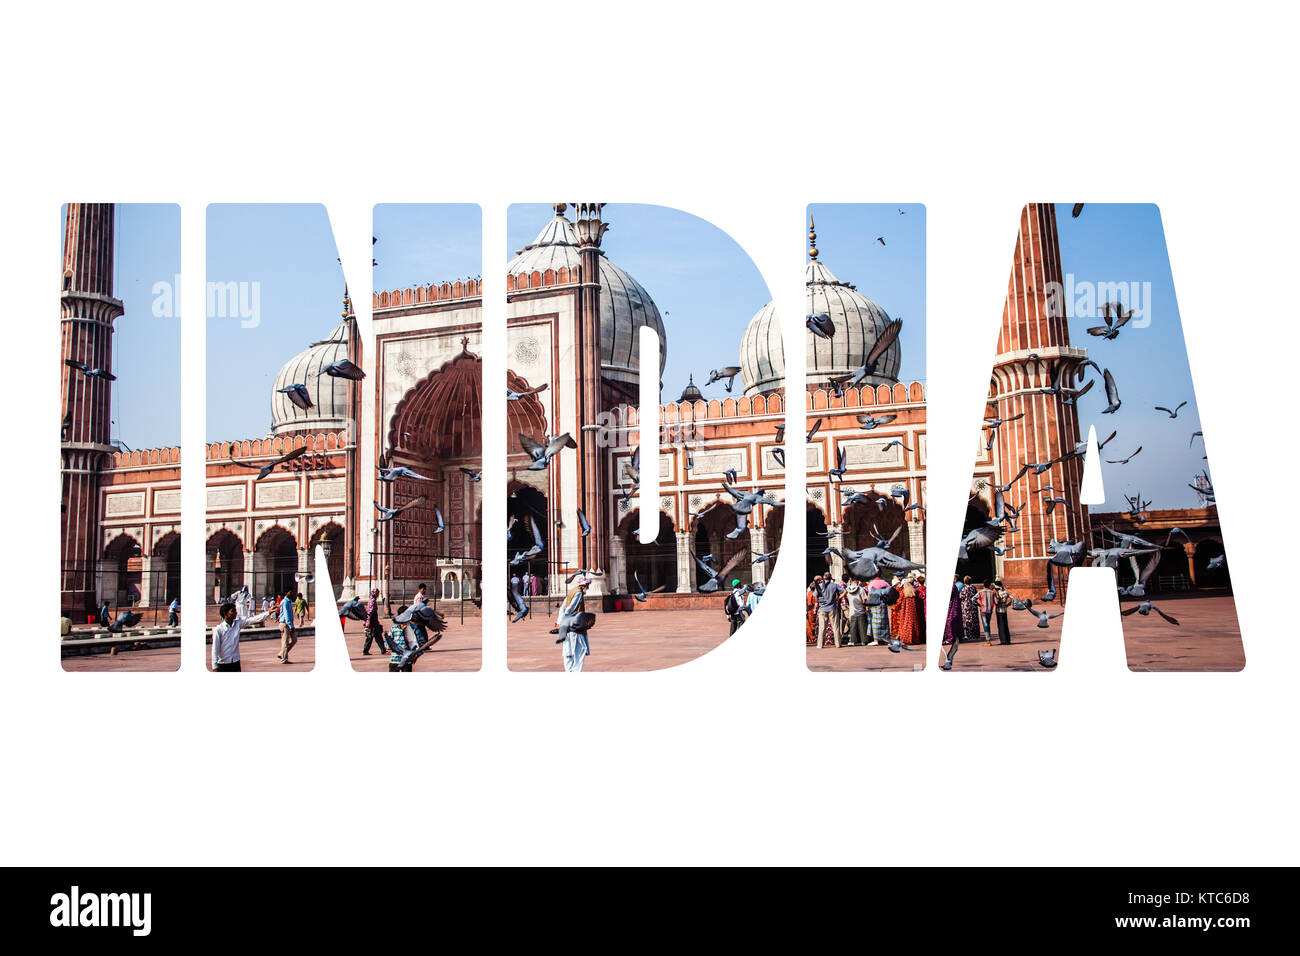 Jama Masjid Mosque, old Delhi, India. - Stock Image